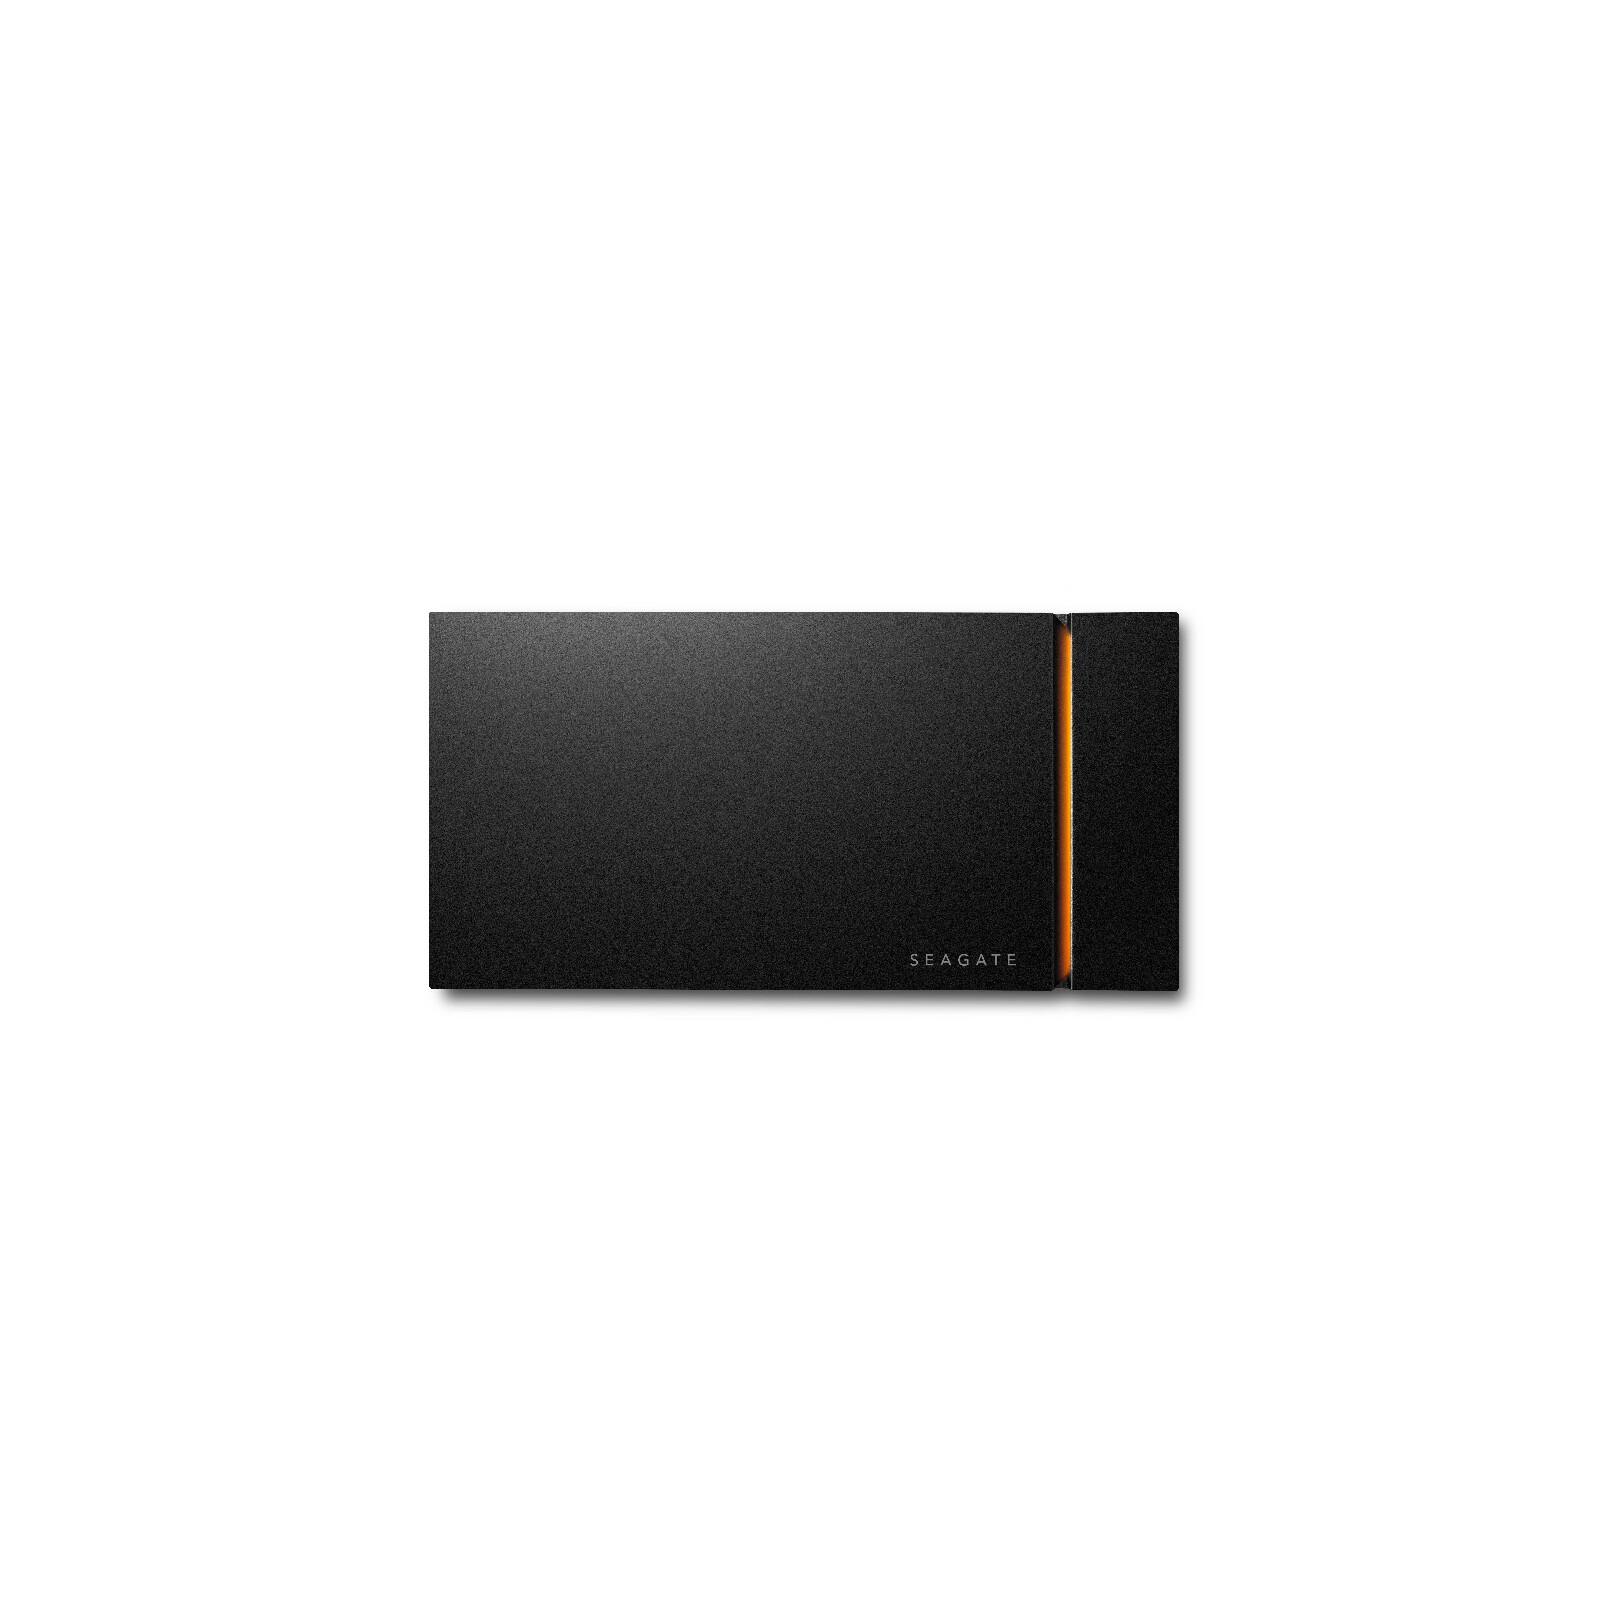 Seagate FireCuda Gaming SSD 1TB extern, NVMe, USB 3.2 gen2x2